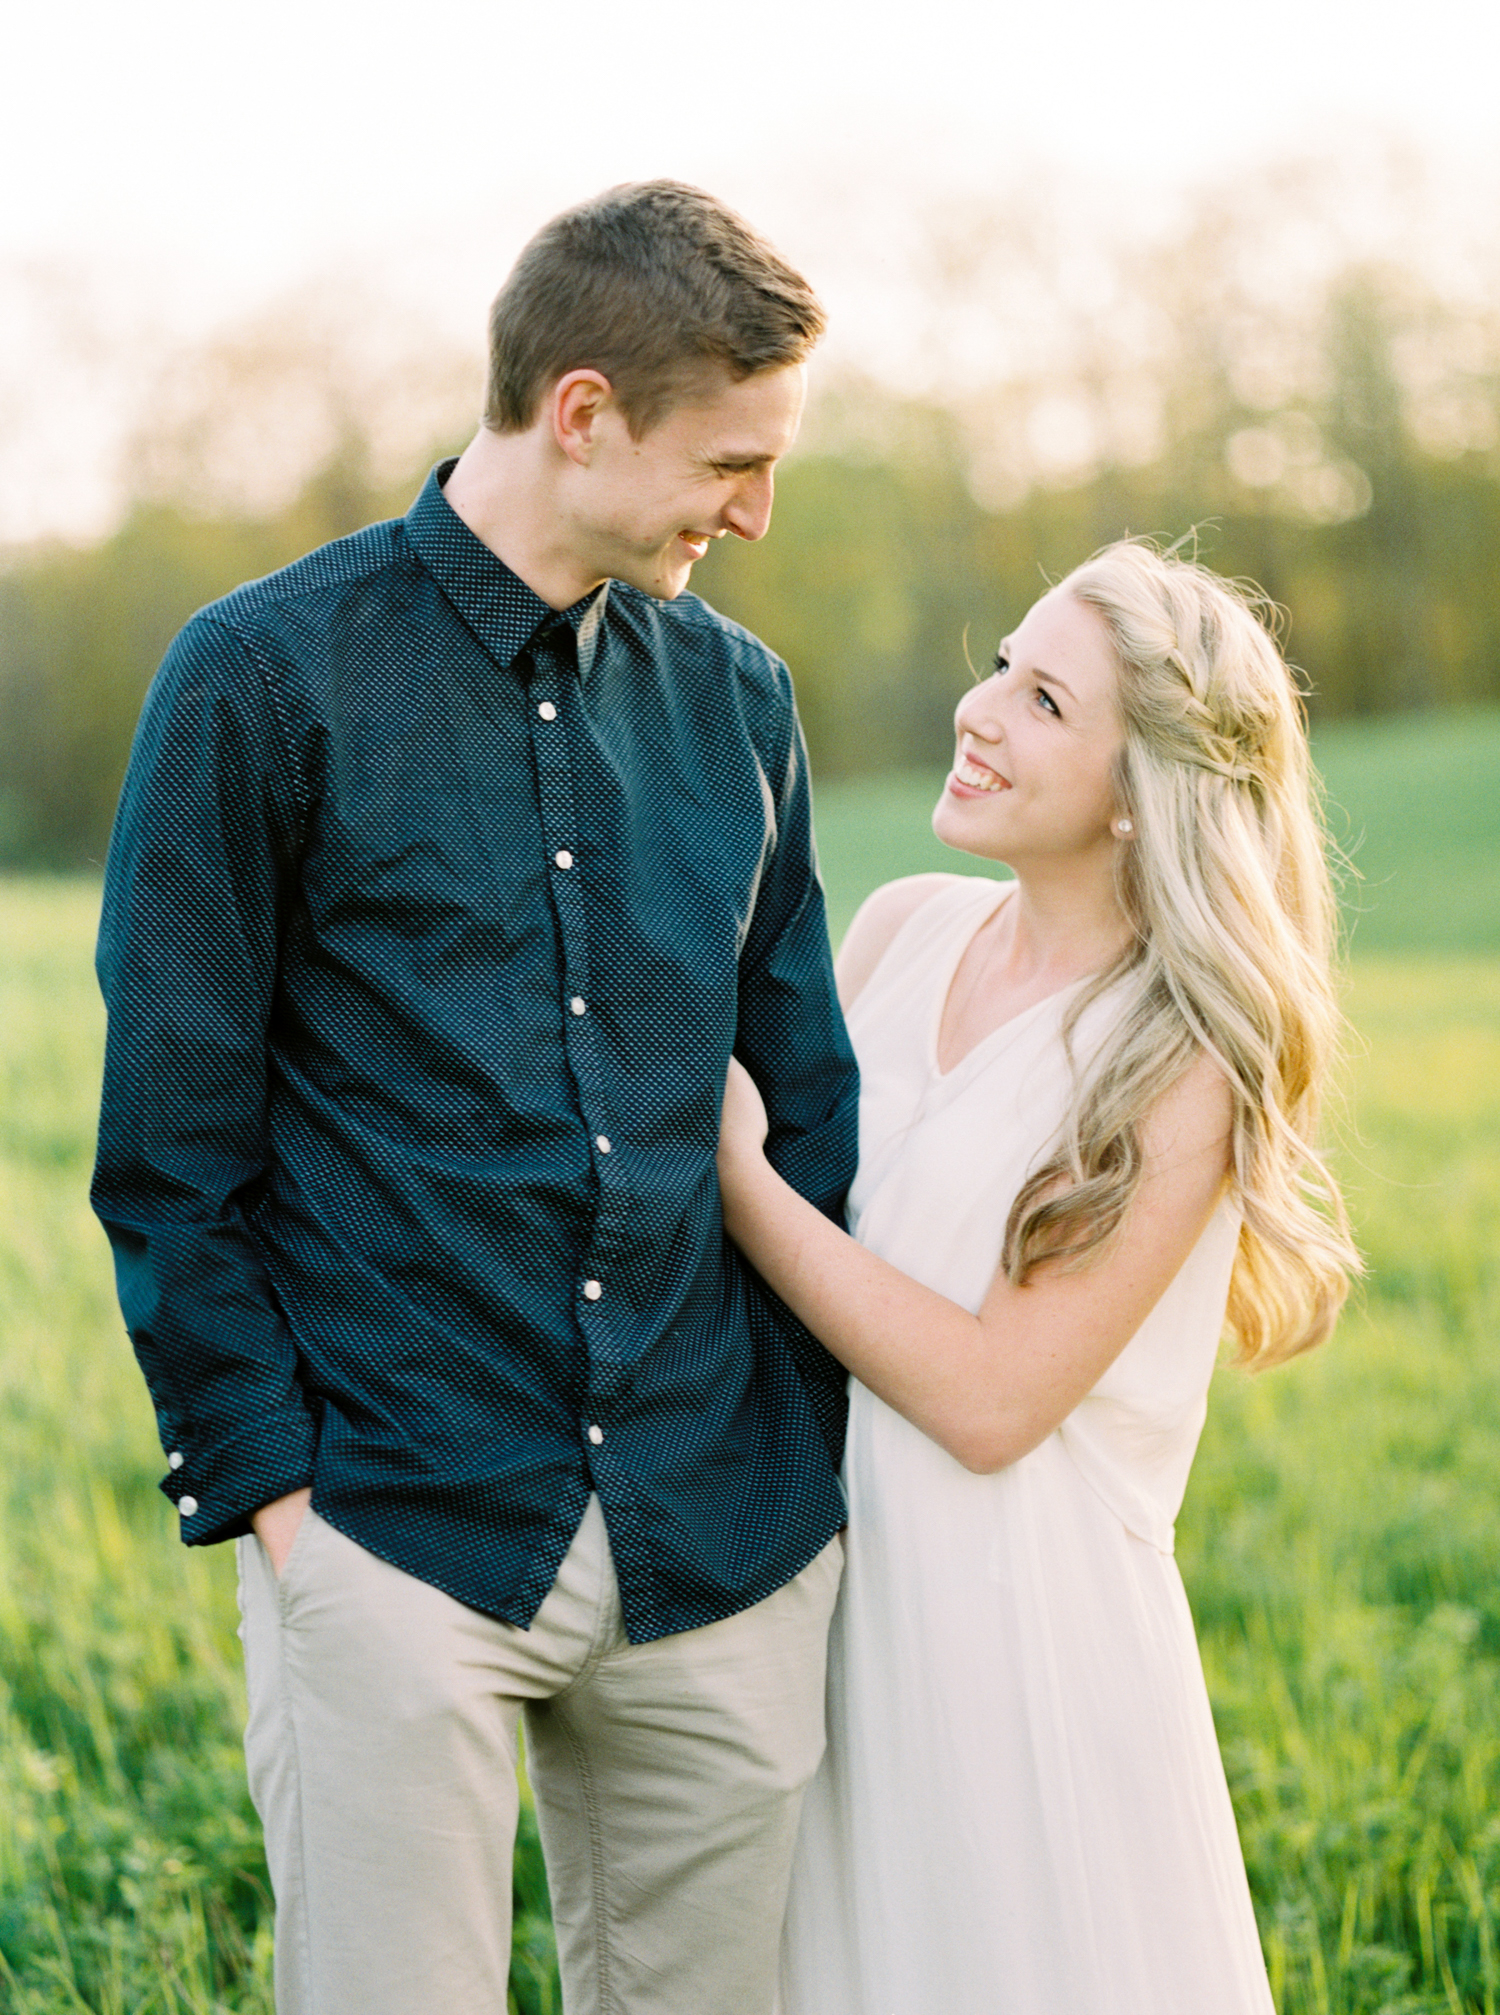 Katie-Nicolle-Niagara-Toronto-Muskoka-Wedding-16.jpg